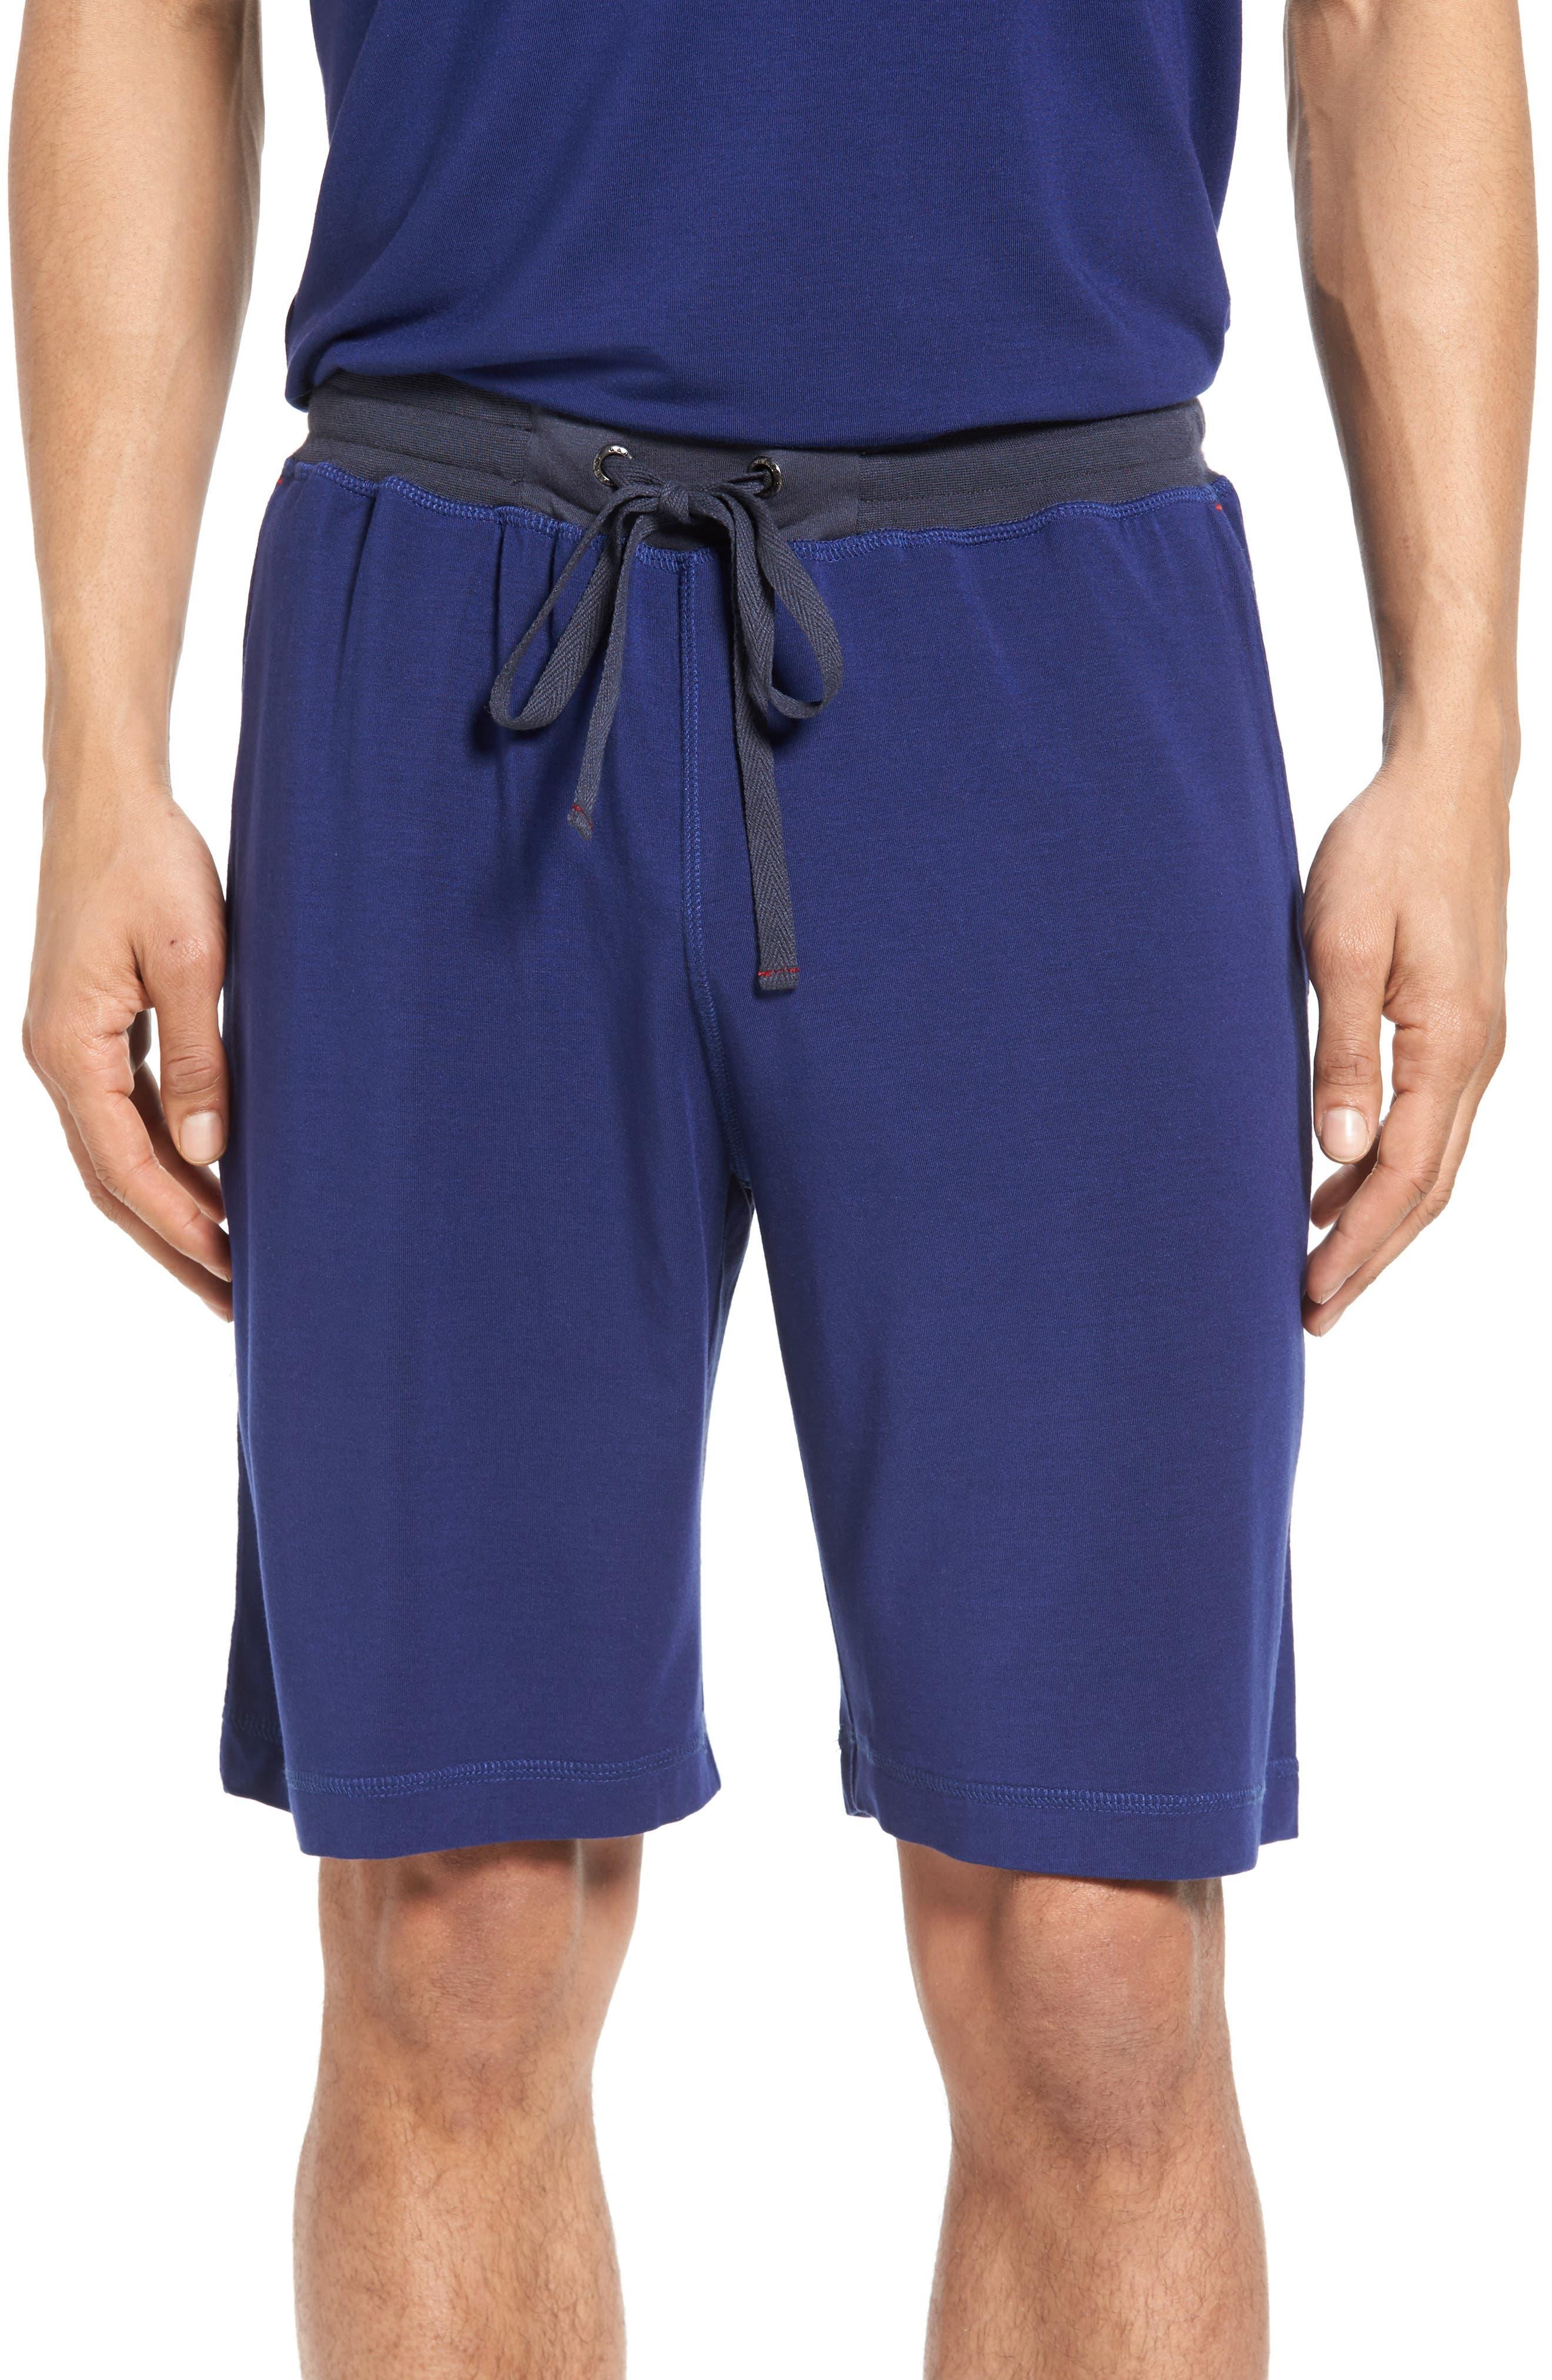 Lounge Shorts,                         Main,                         color, Bright Blue